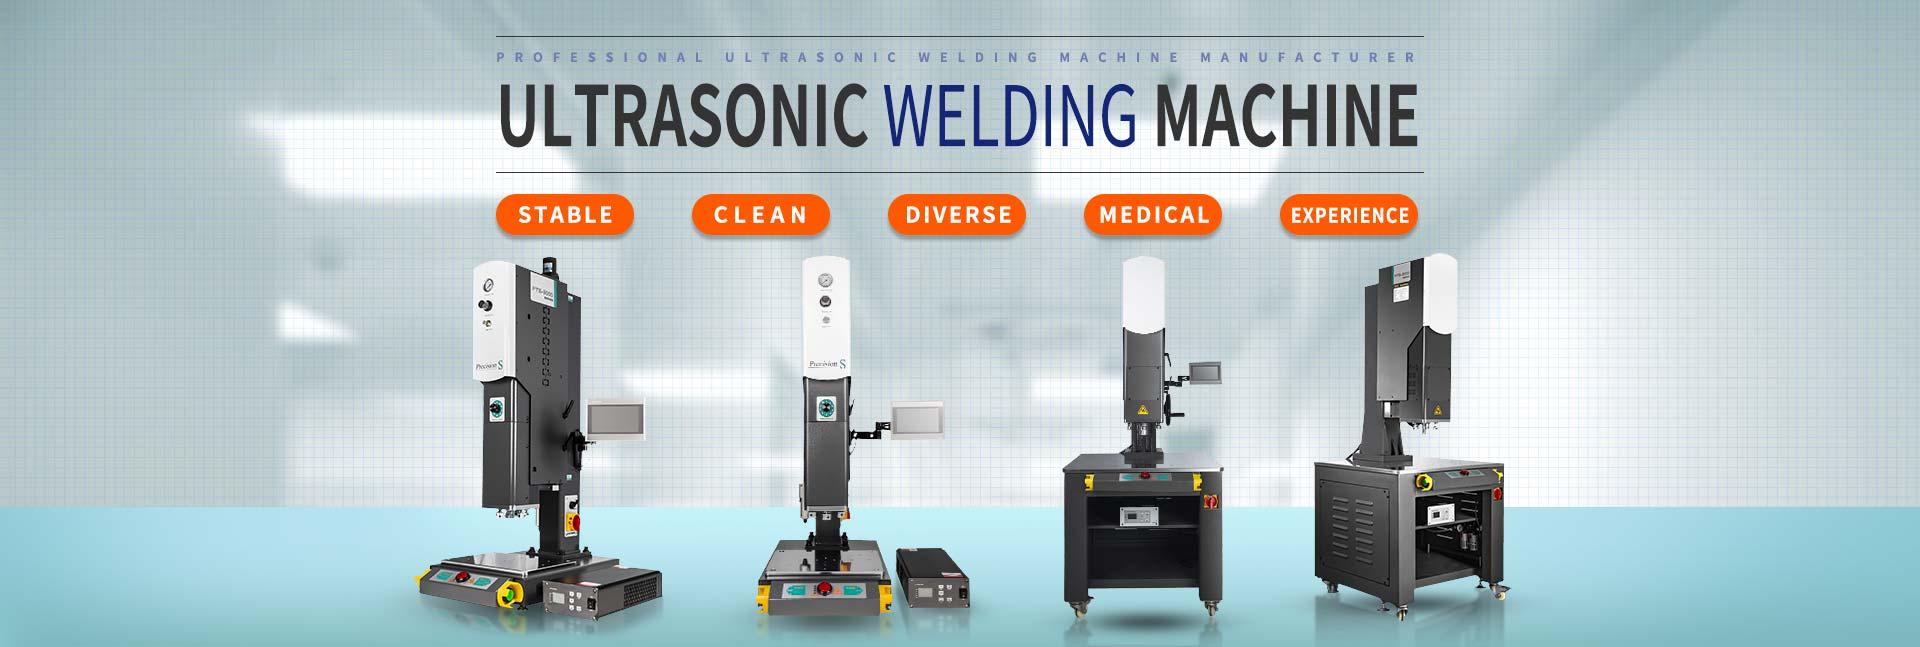 Ultrasonic welding machine manufacturers